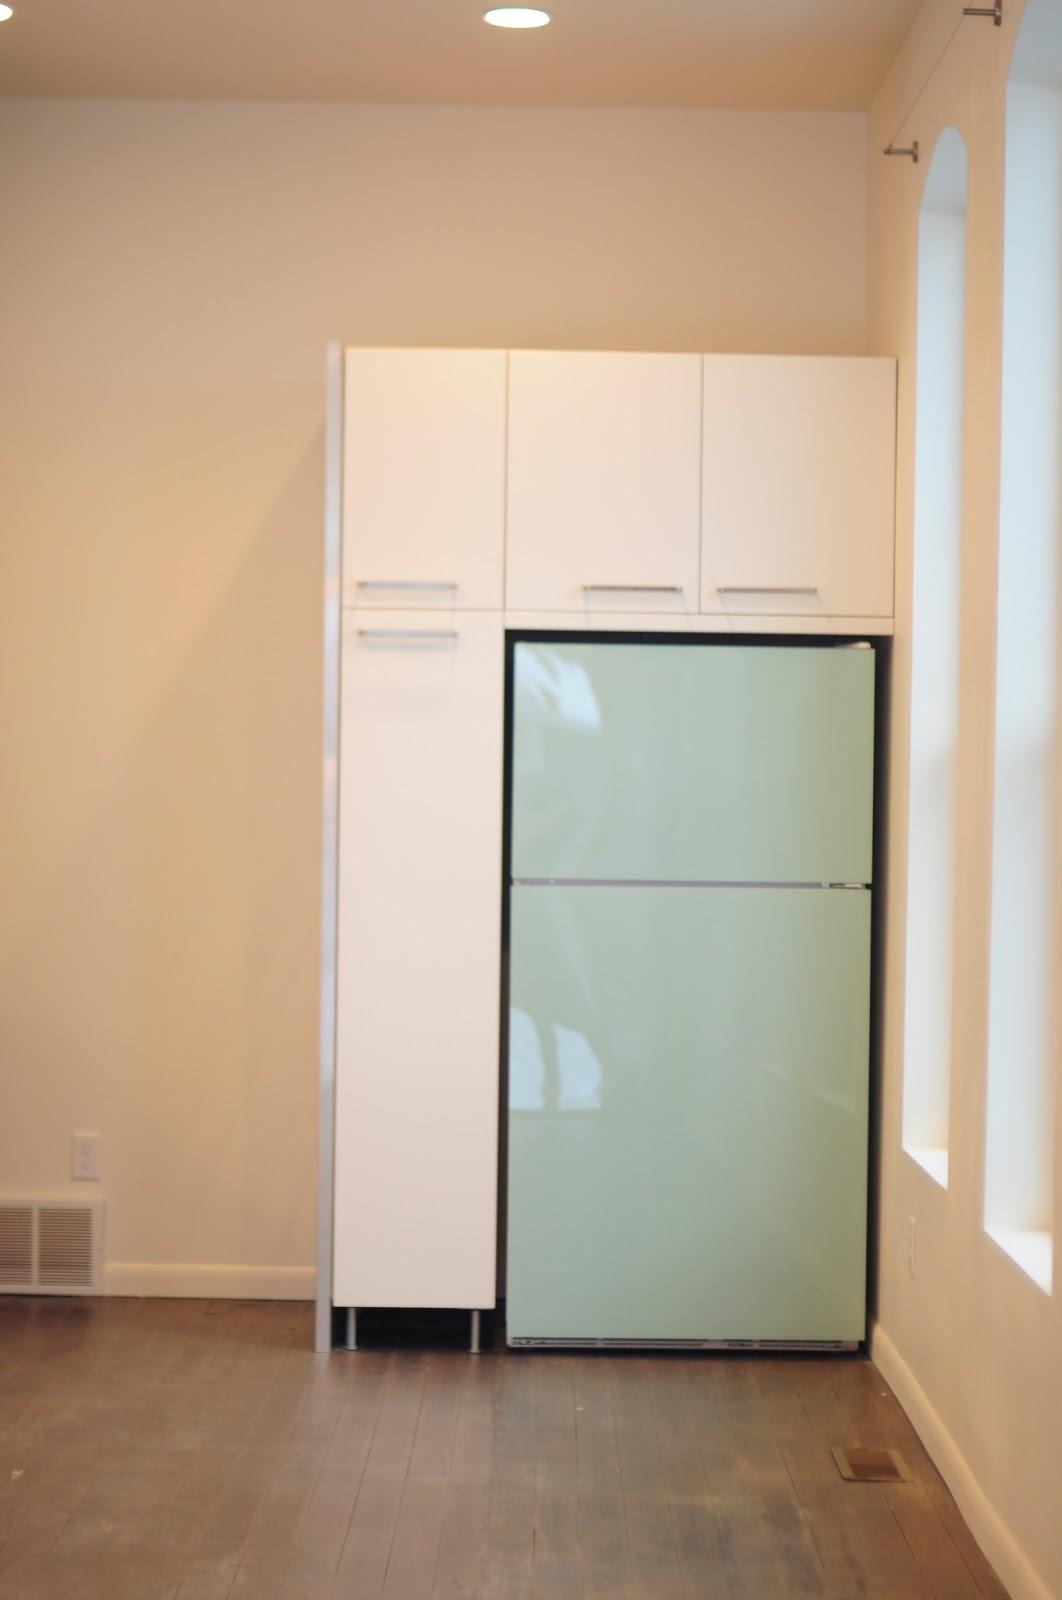 Diy Painted Plexiglass Refrigerator Panels